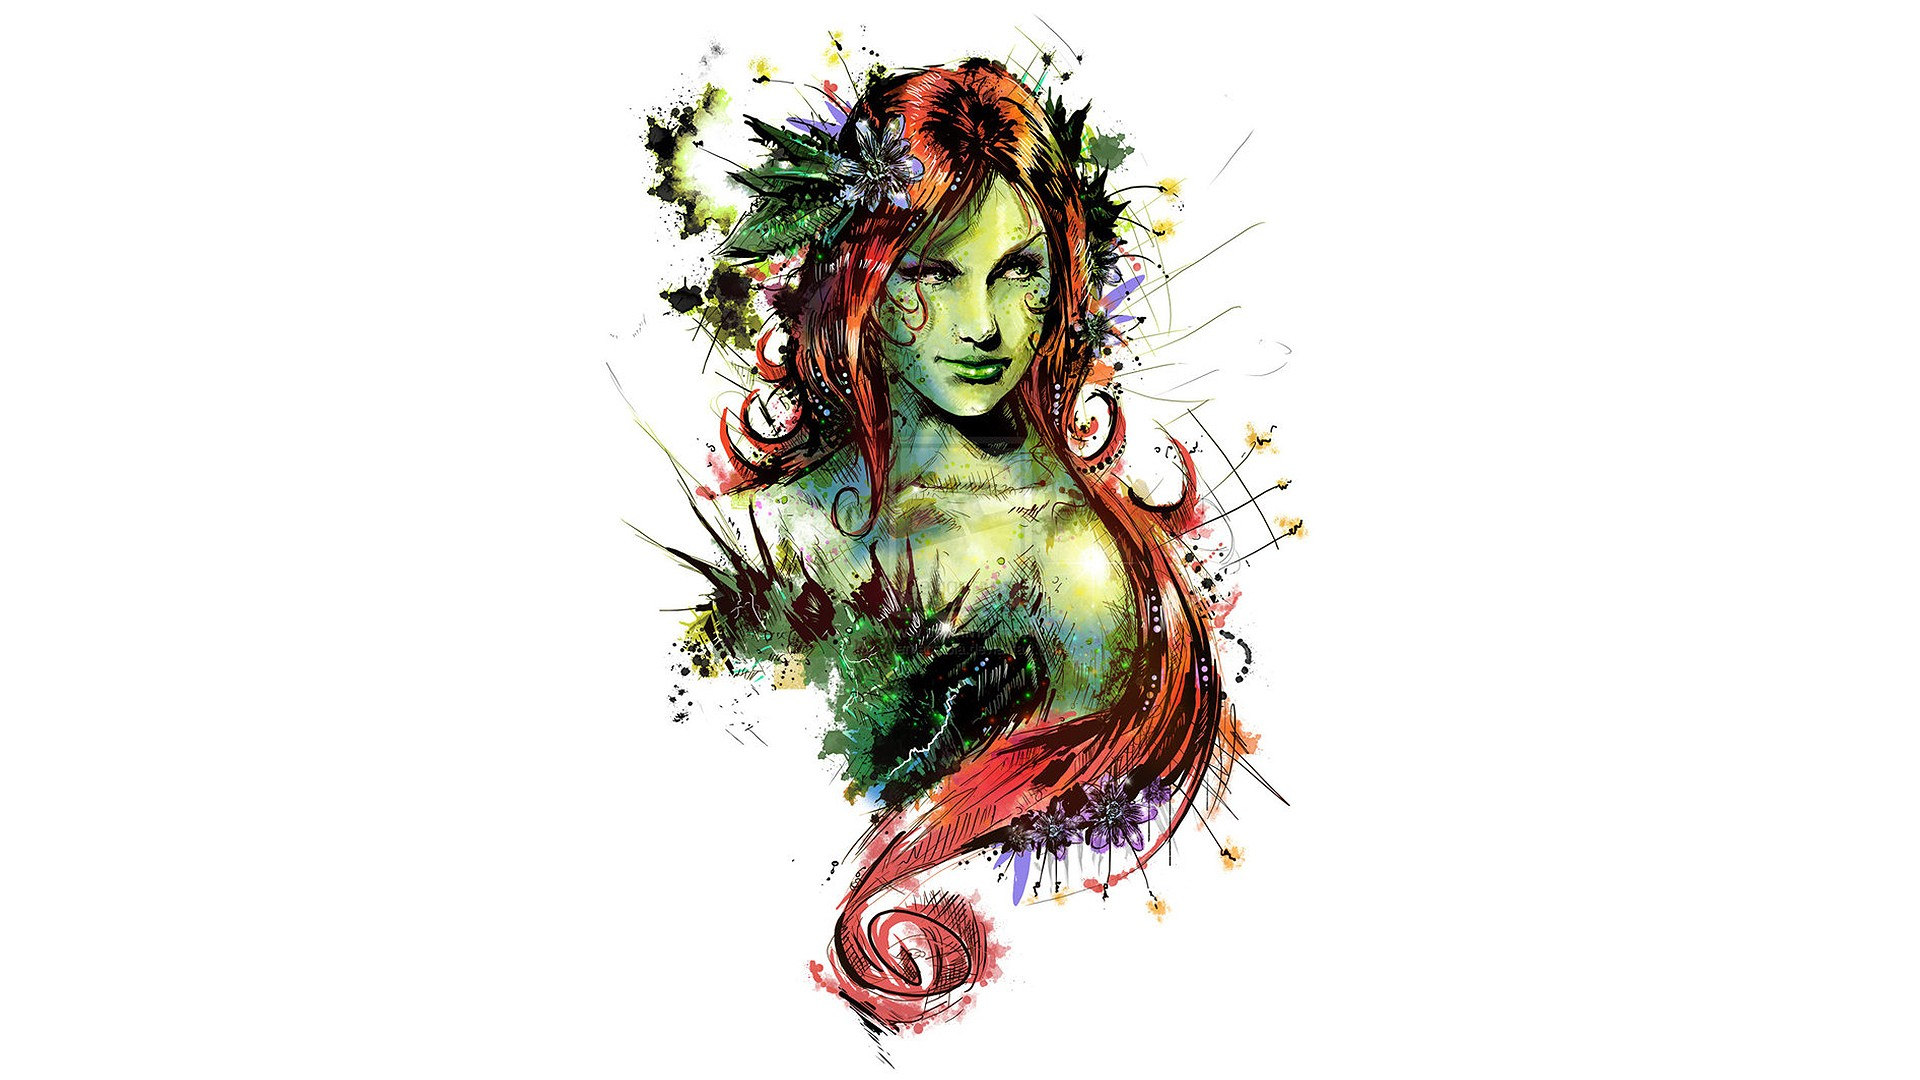 poison ivy computer wallpaper desktop background